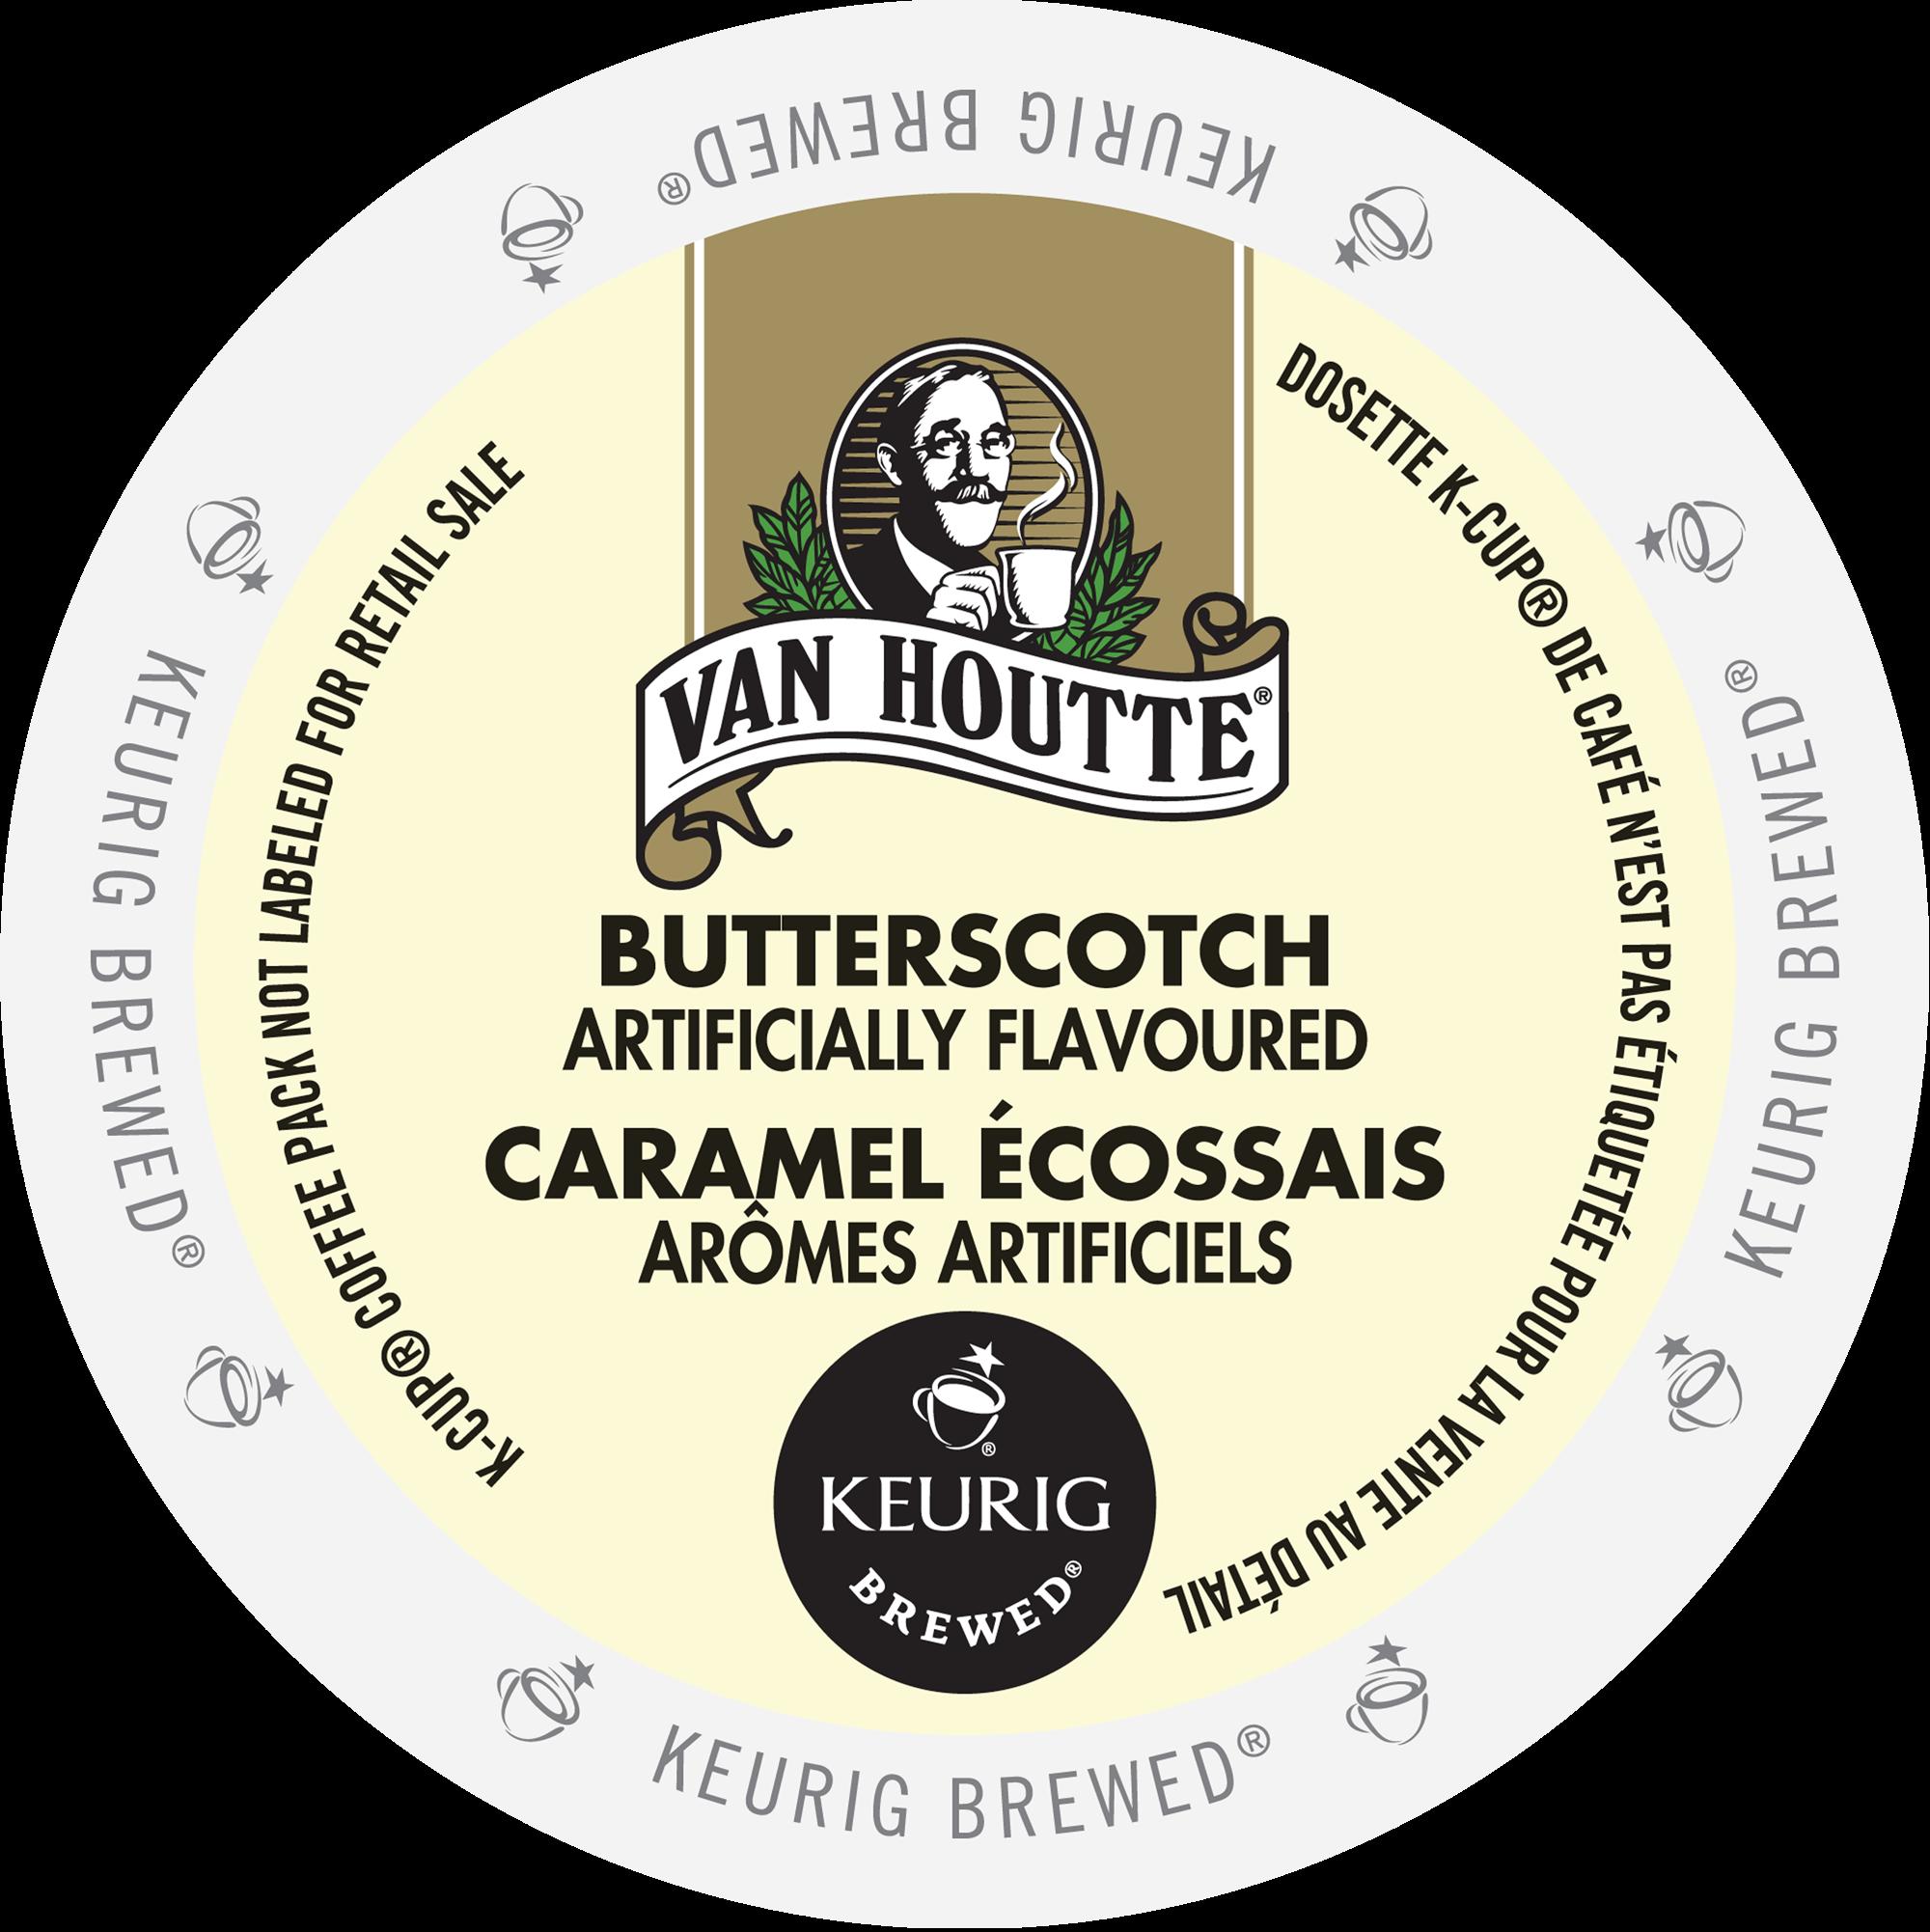 butterscotch-coffee-van-houtte-k-cup_ca_general